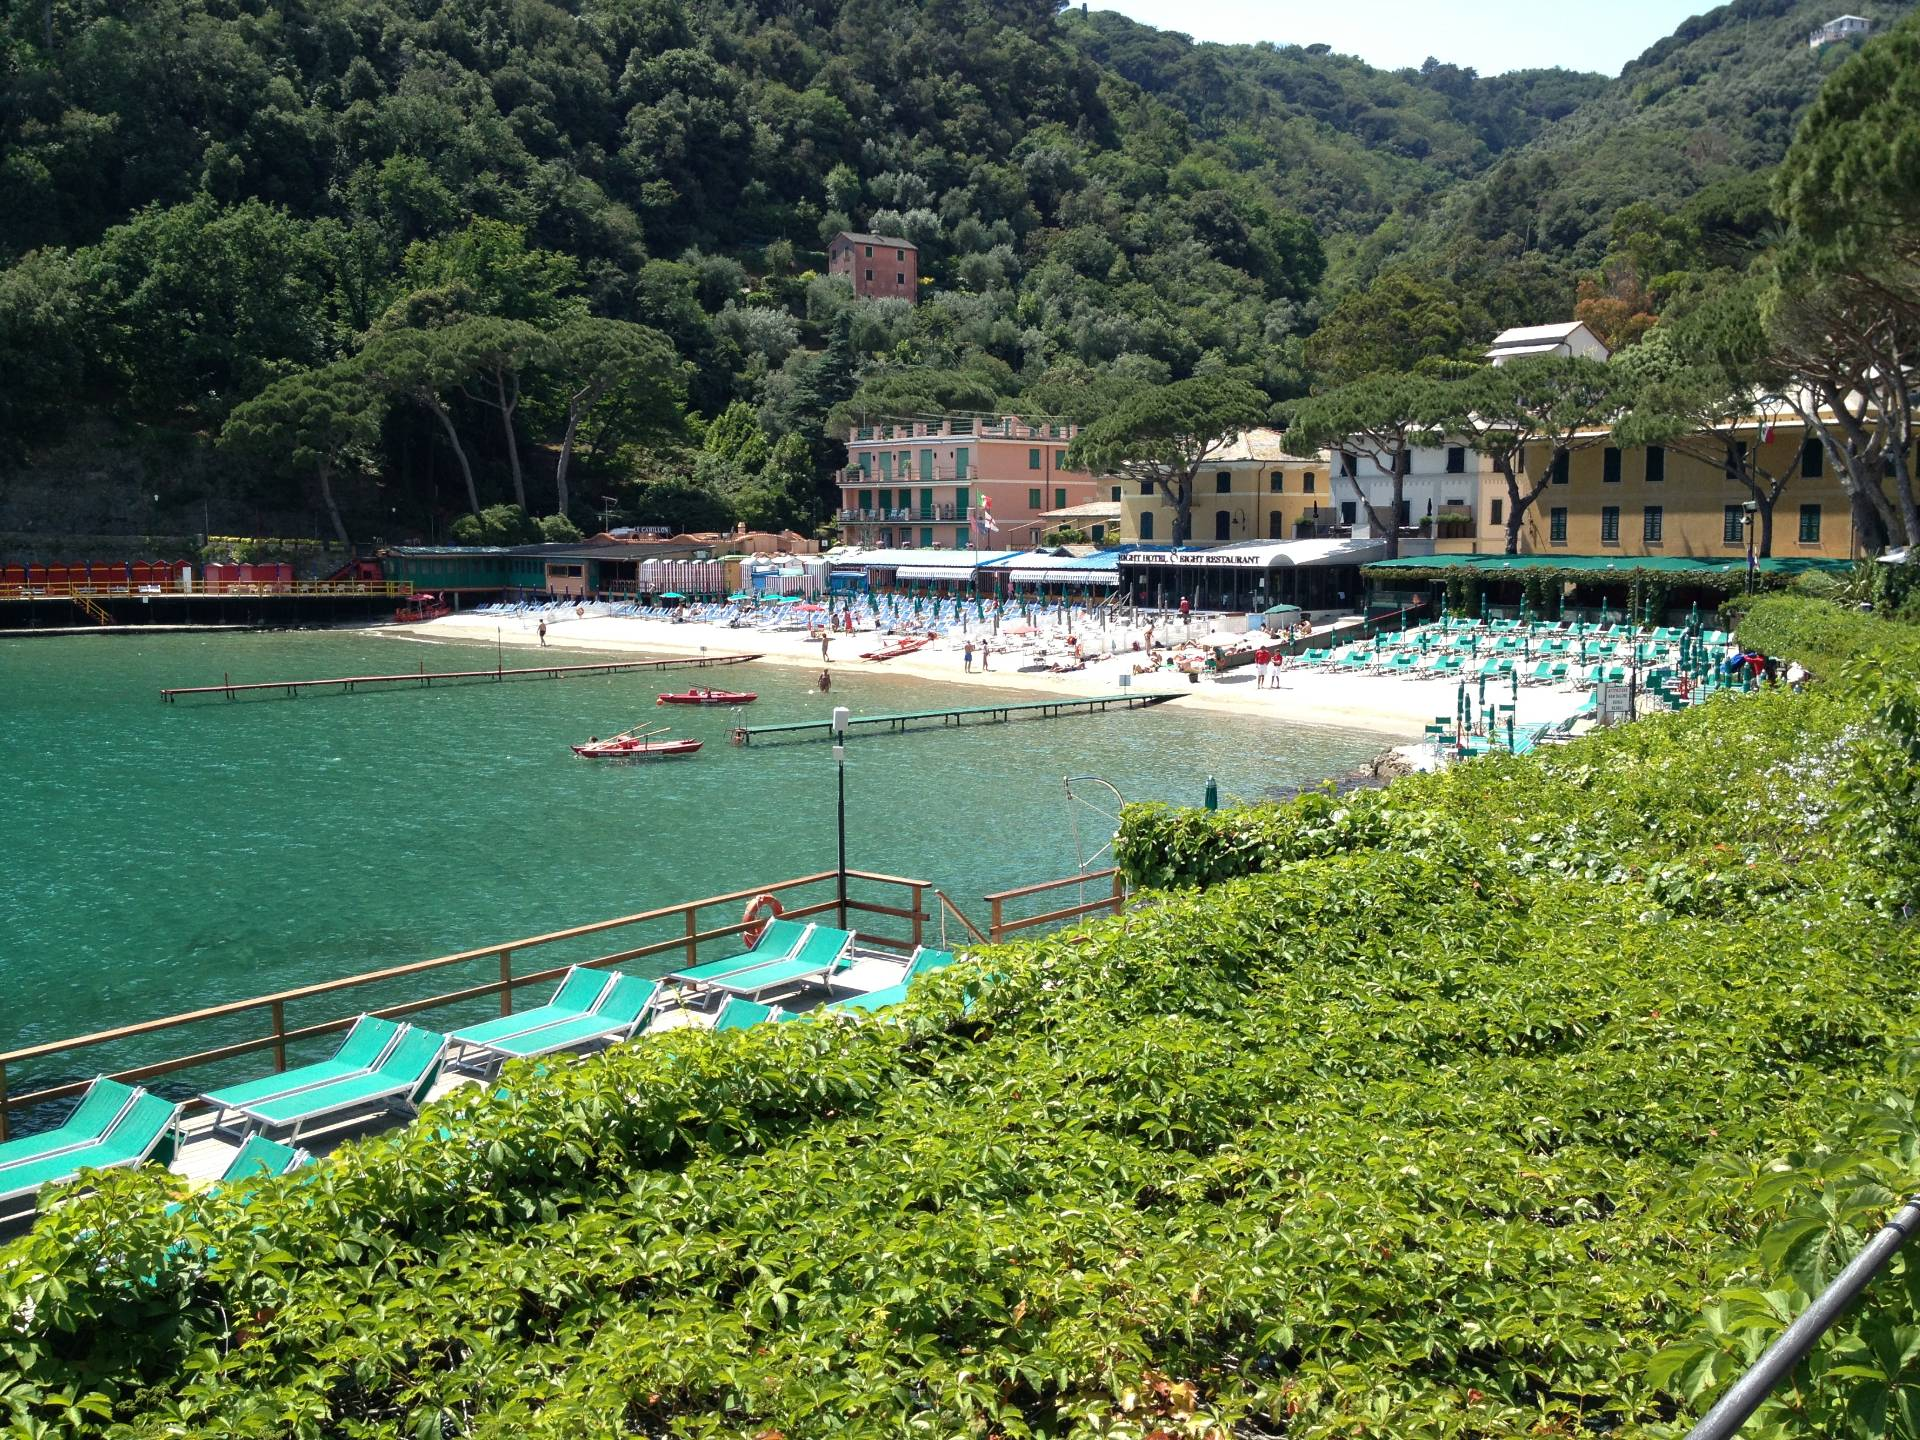 Bilocale Santa Margherita Ligure Via Paraggi A Monte 3